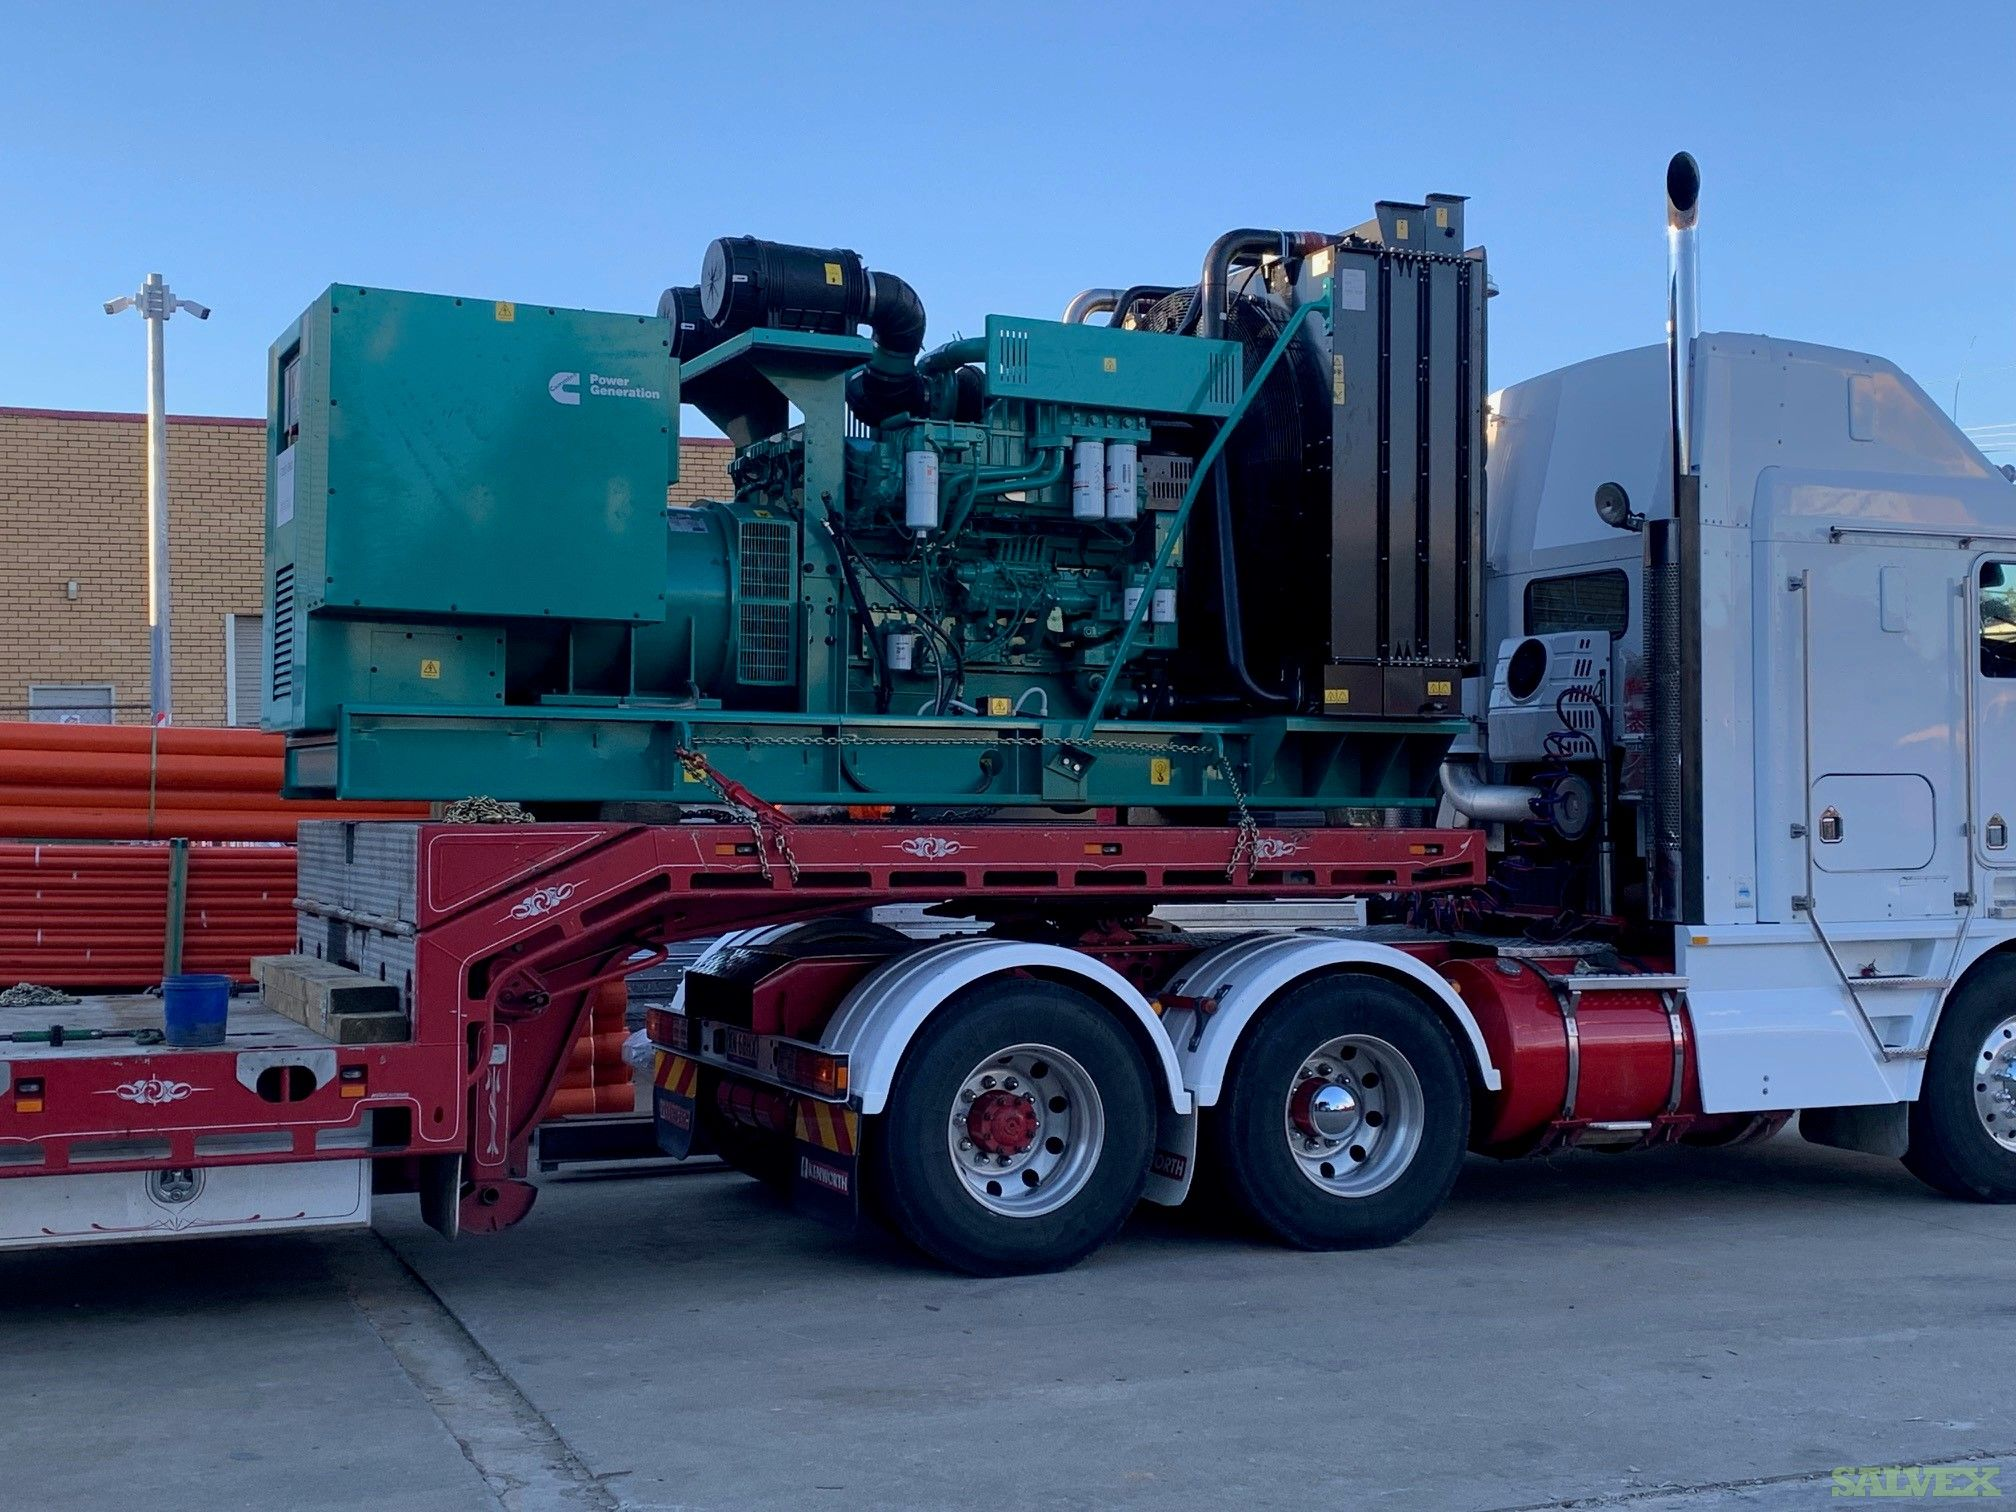 Cummins QST30G4 Generator(1 Unit)